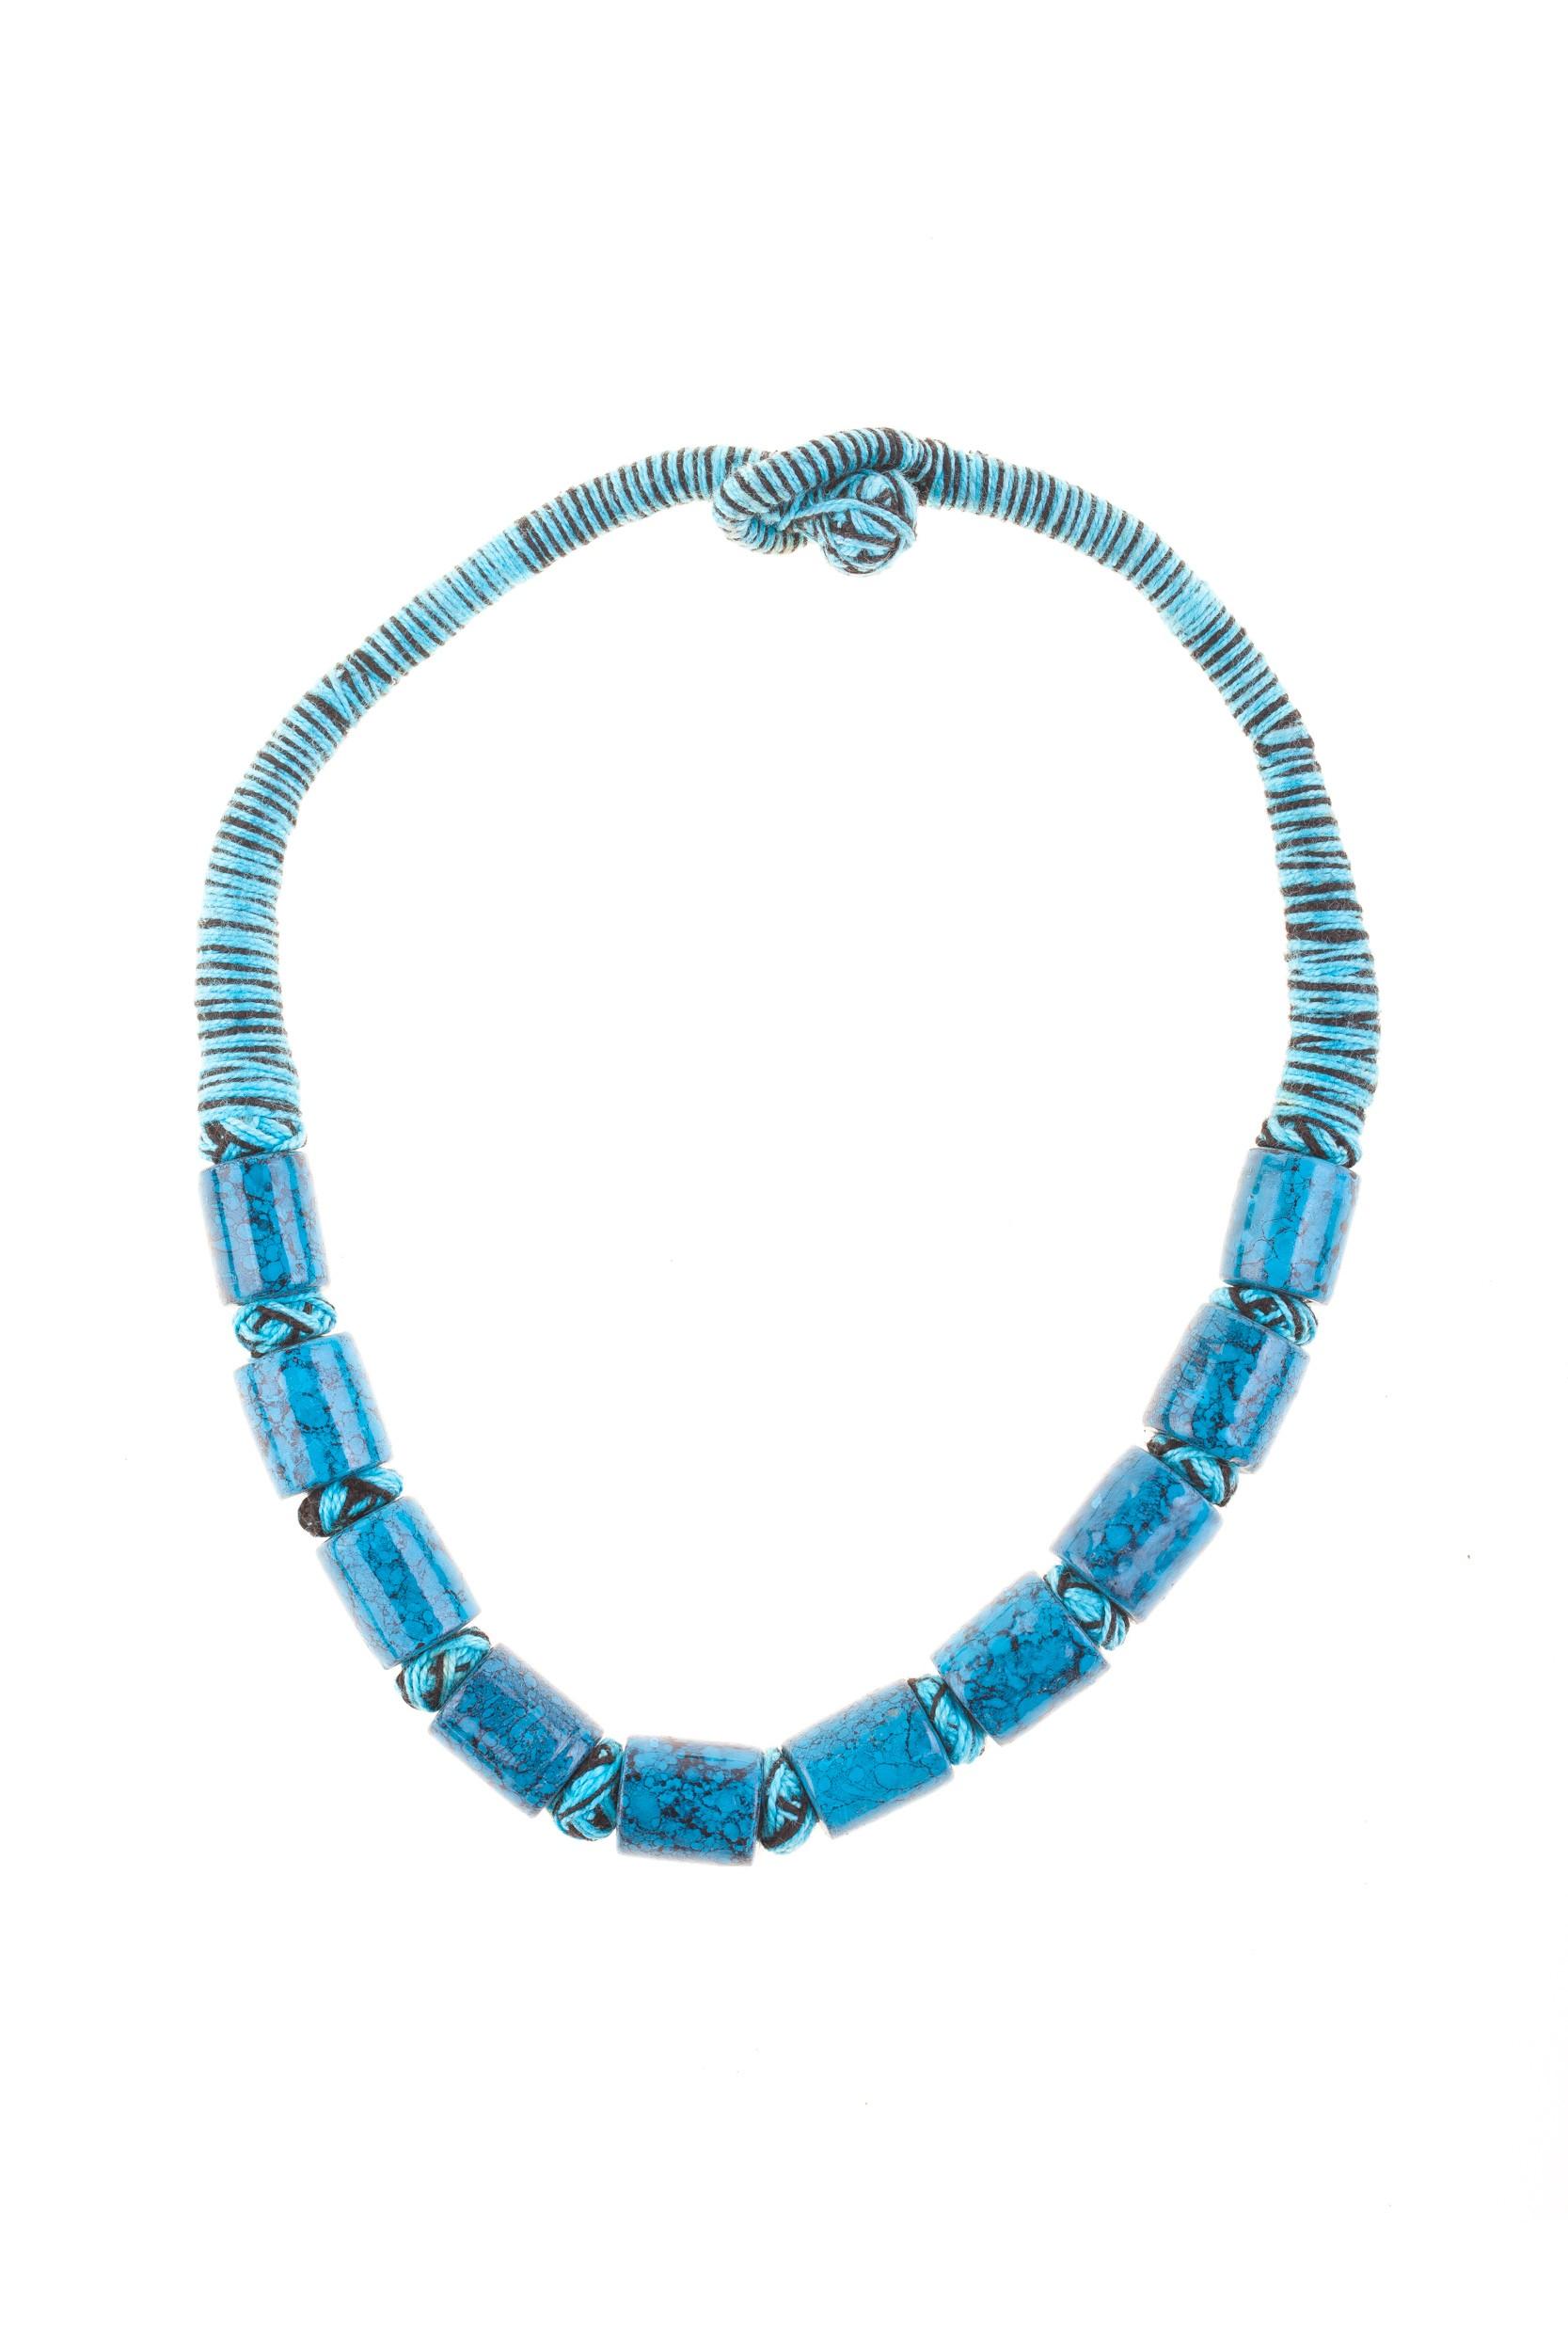 Colier tibetan bleu